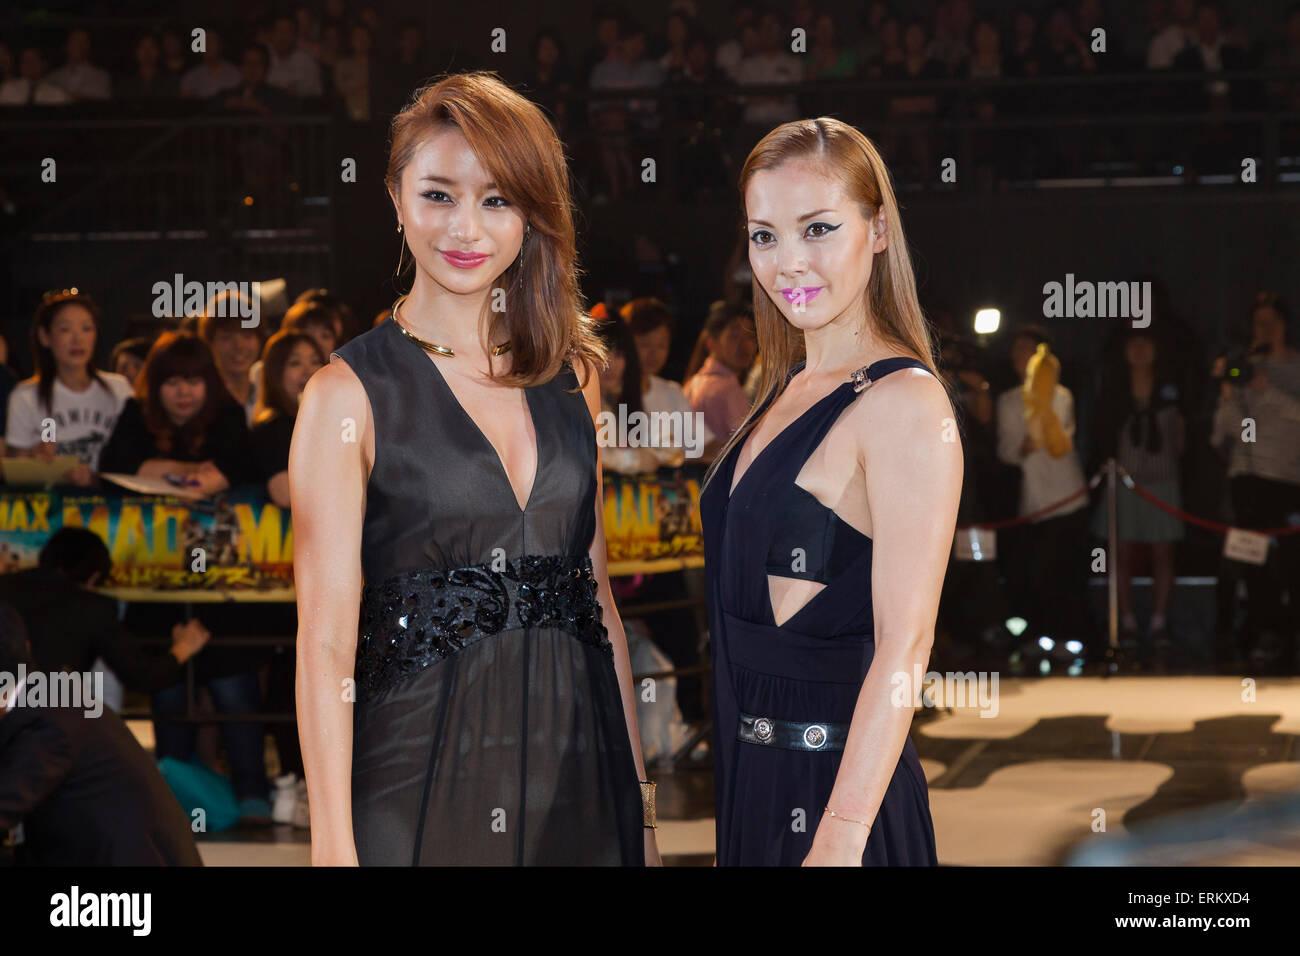 (L to R) Fashion model and actress Maryjun Takahashi and the singer, actress and fashion model Anna Tsuchiya pose - Stock Image